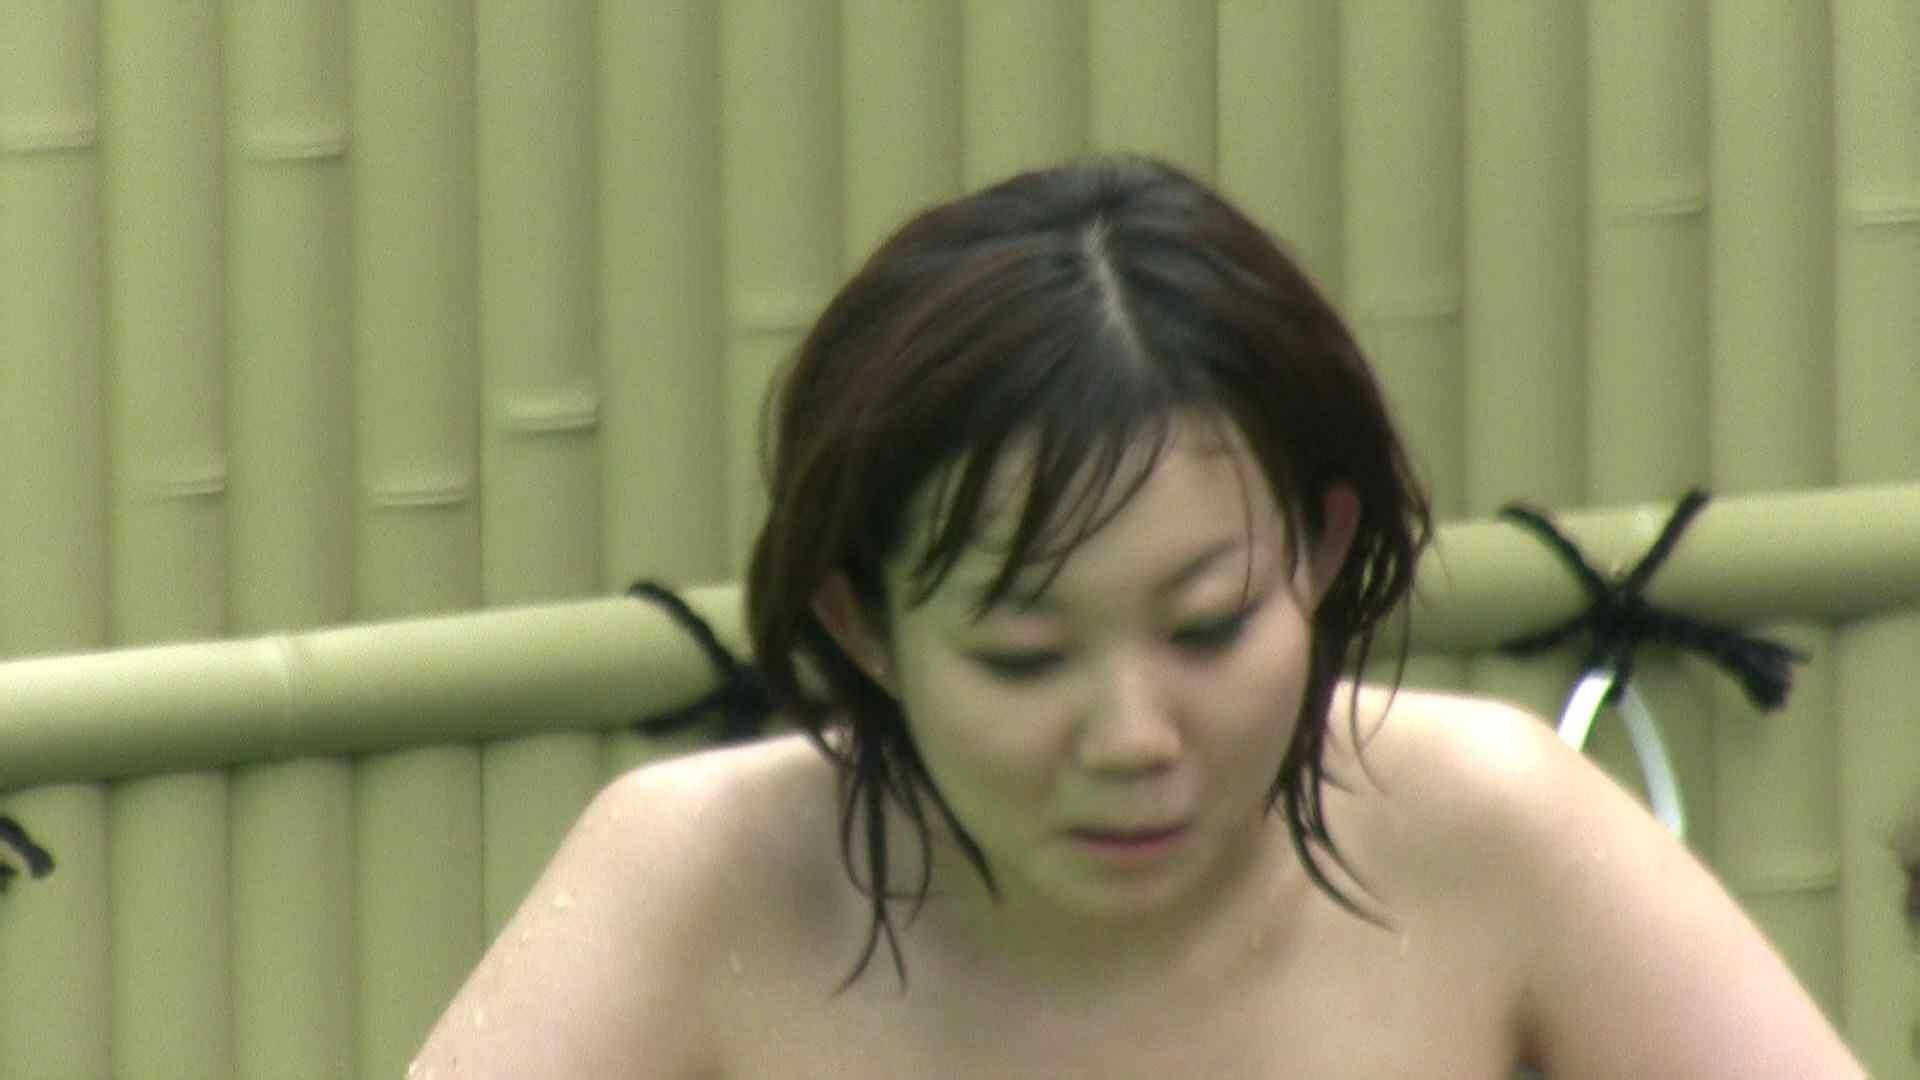 Aquaな露天風呂Vol.664 盗撮  70連発 57